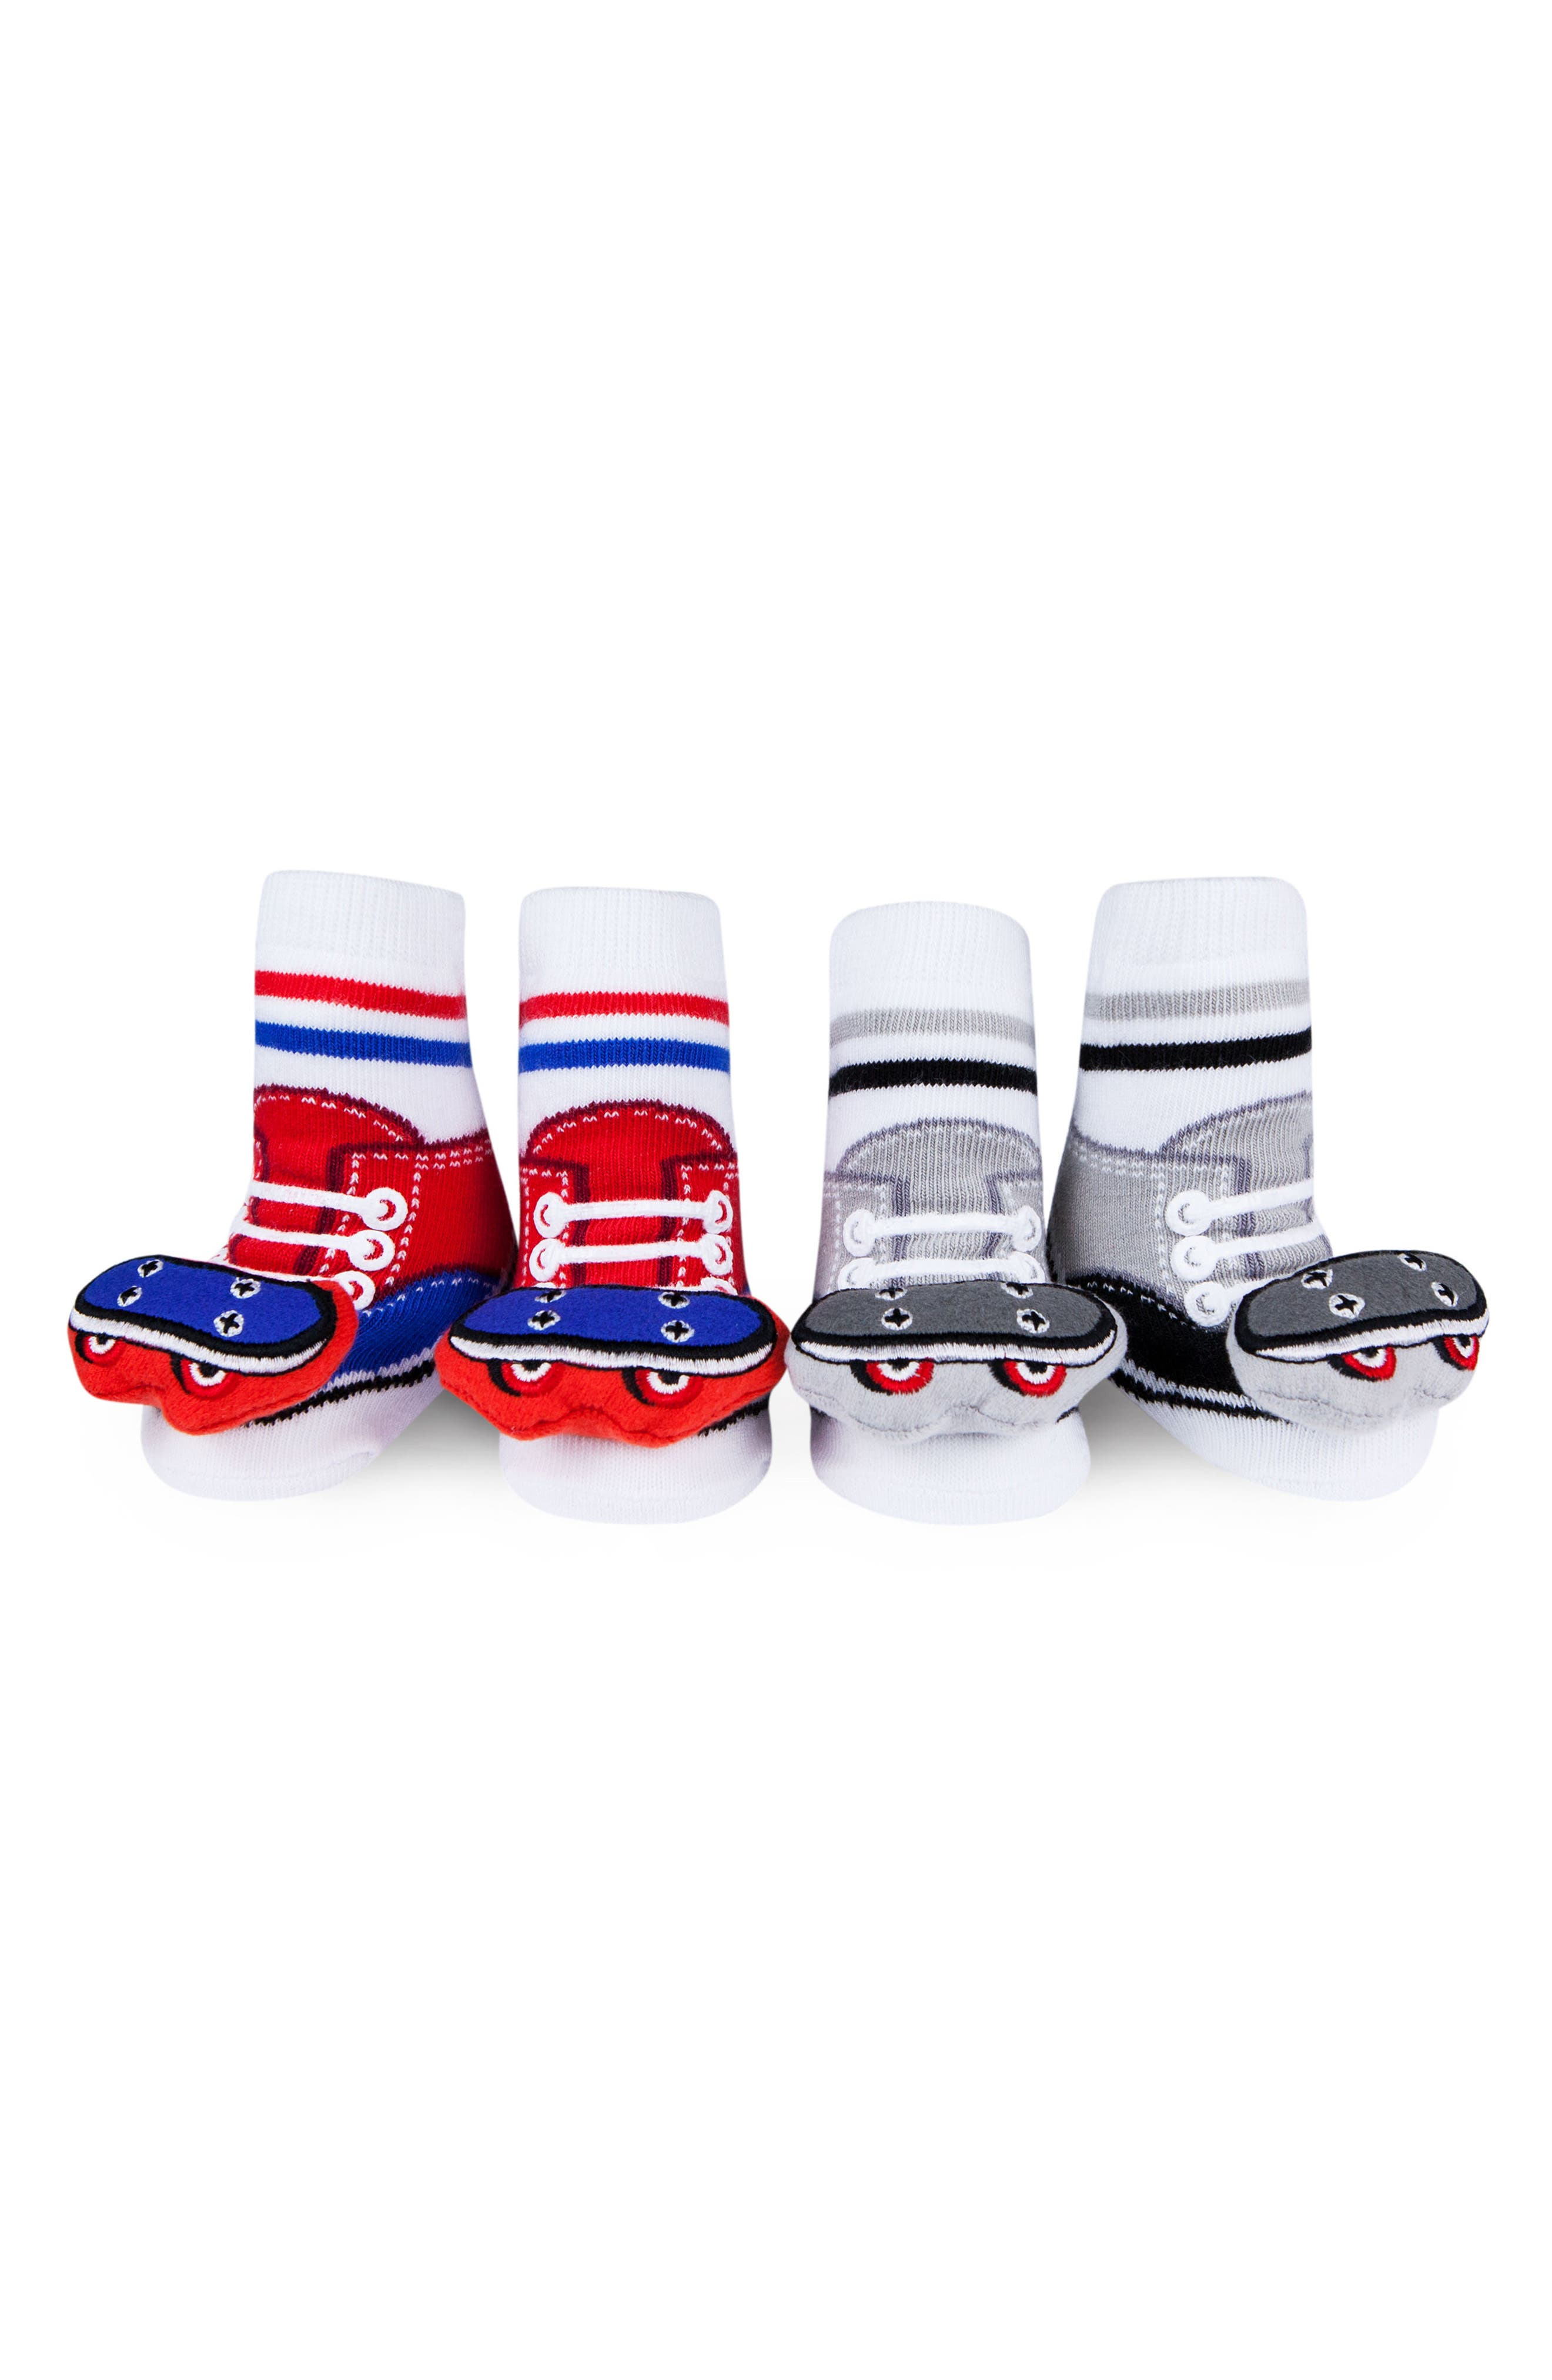 2-Pack Skateboard Rattle Socks,                             Main thumbnail 1, color,                             Red/ Grey